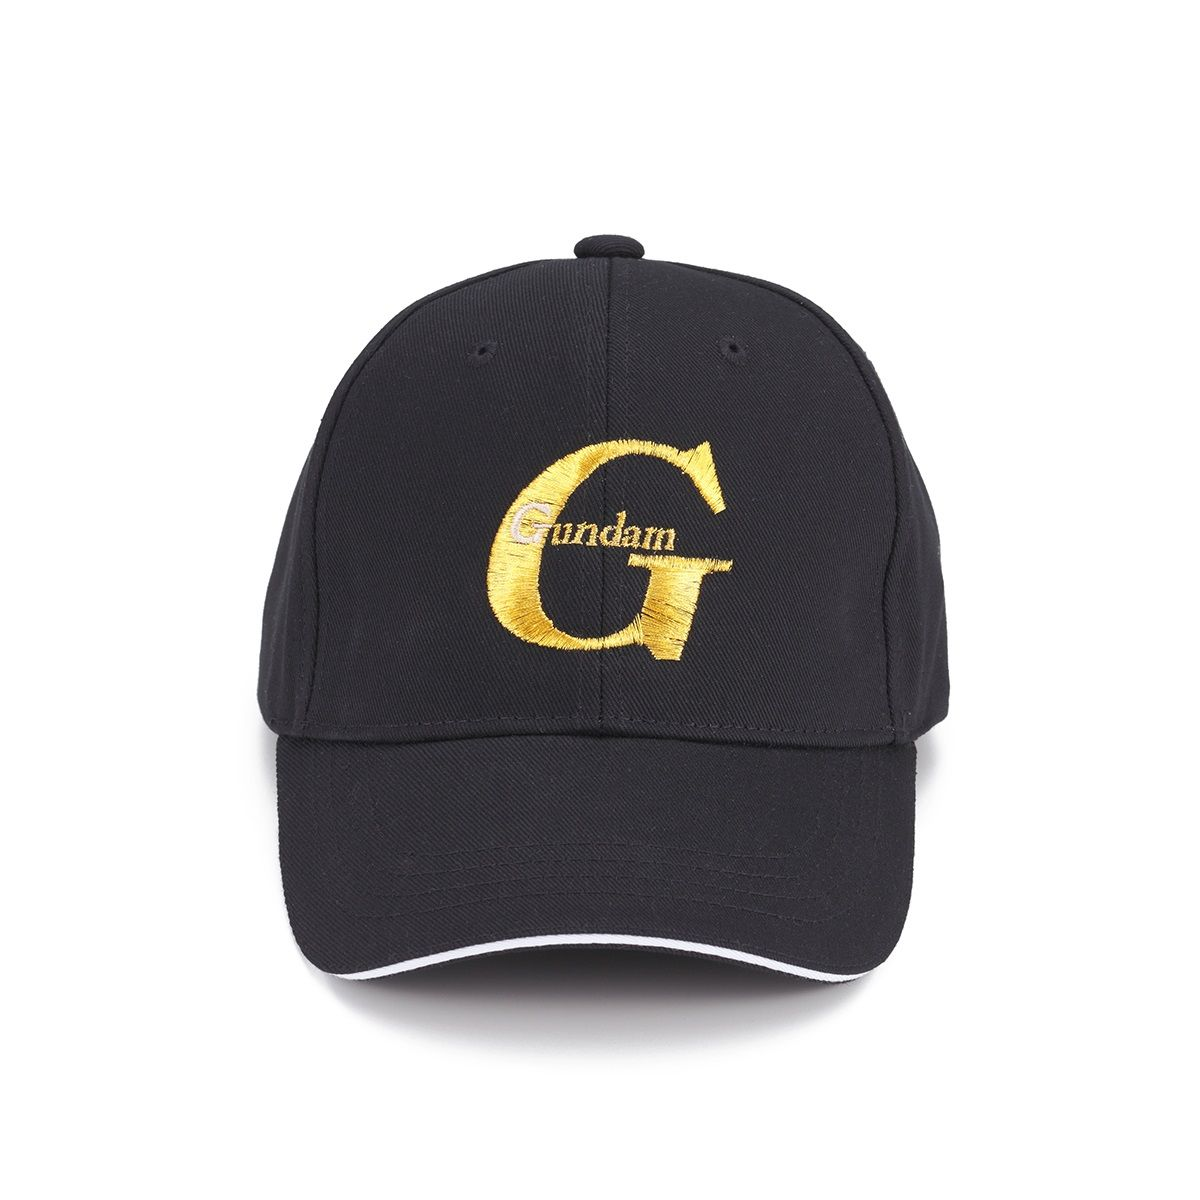 G Emblem Cap—Gundam Reconguista in G Cap